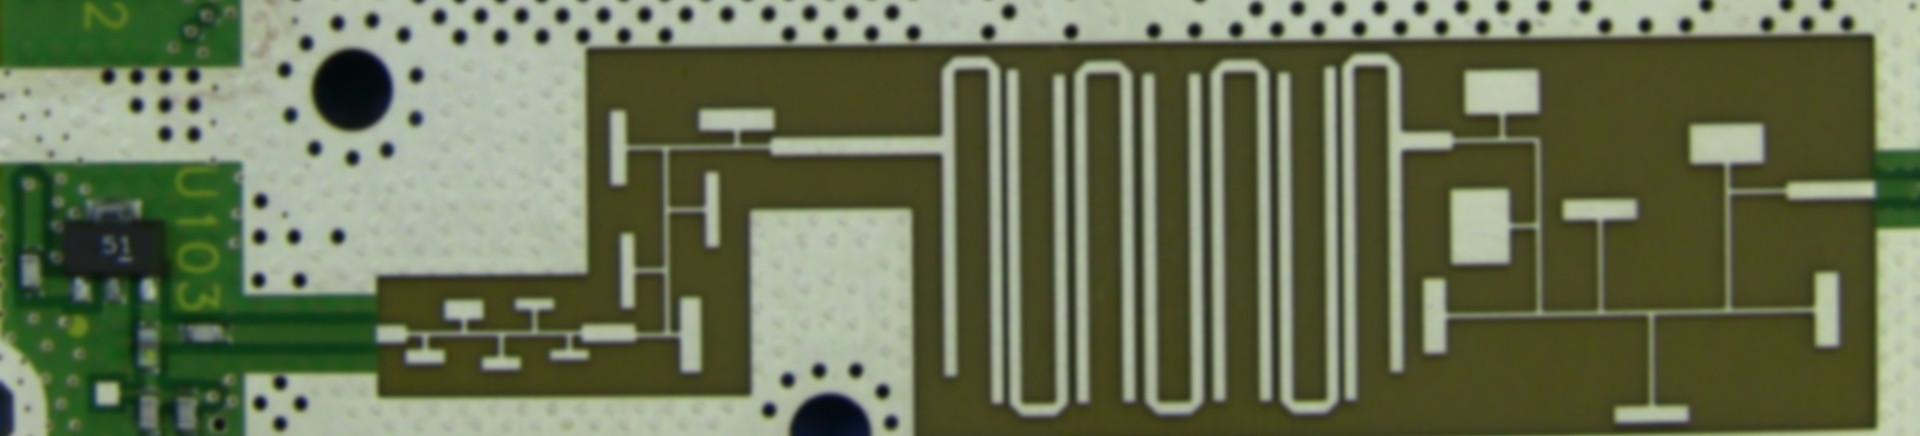 ingegneria delle microonde e radiofrequenze italian edition